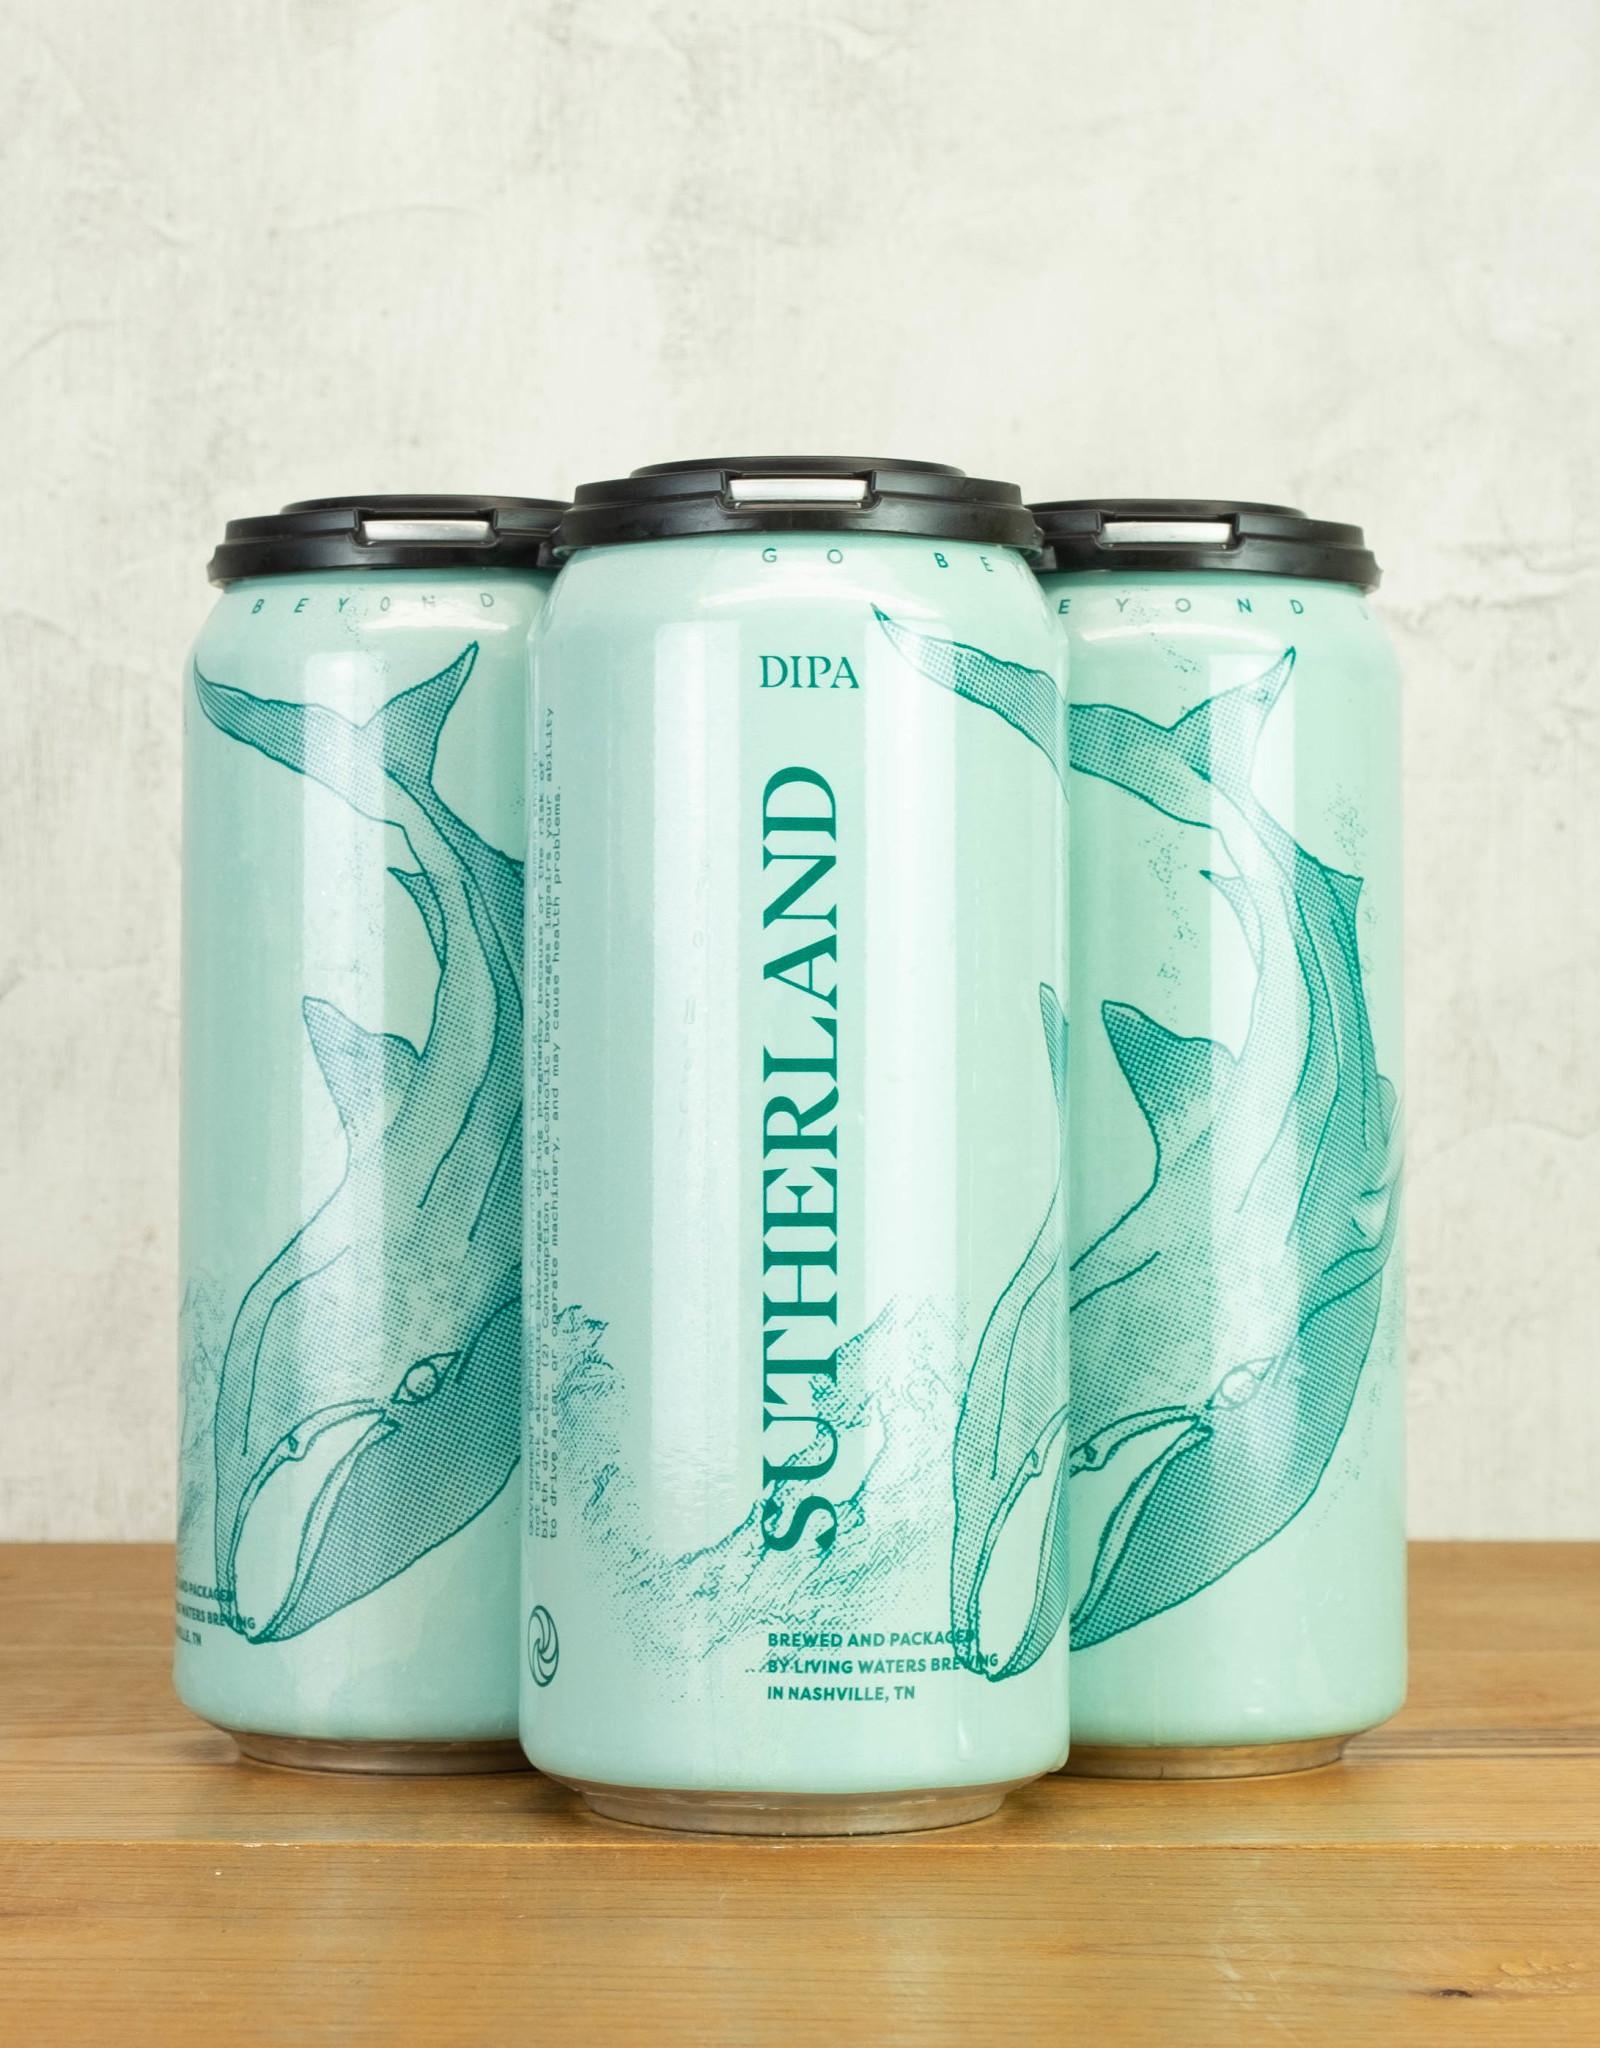 Living Waters Sutherland DIP 4pk